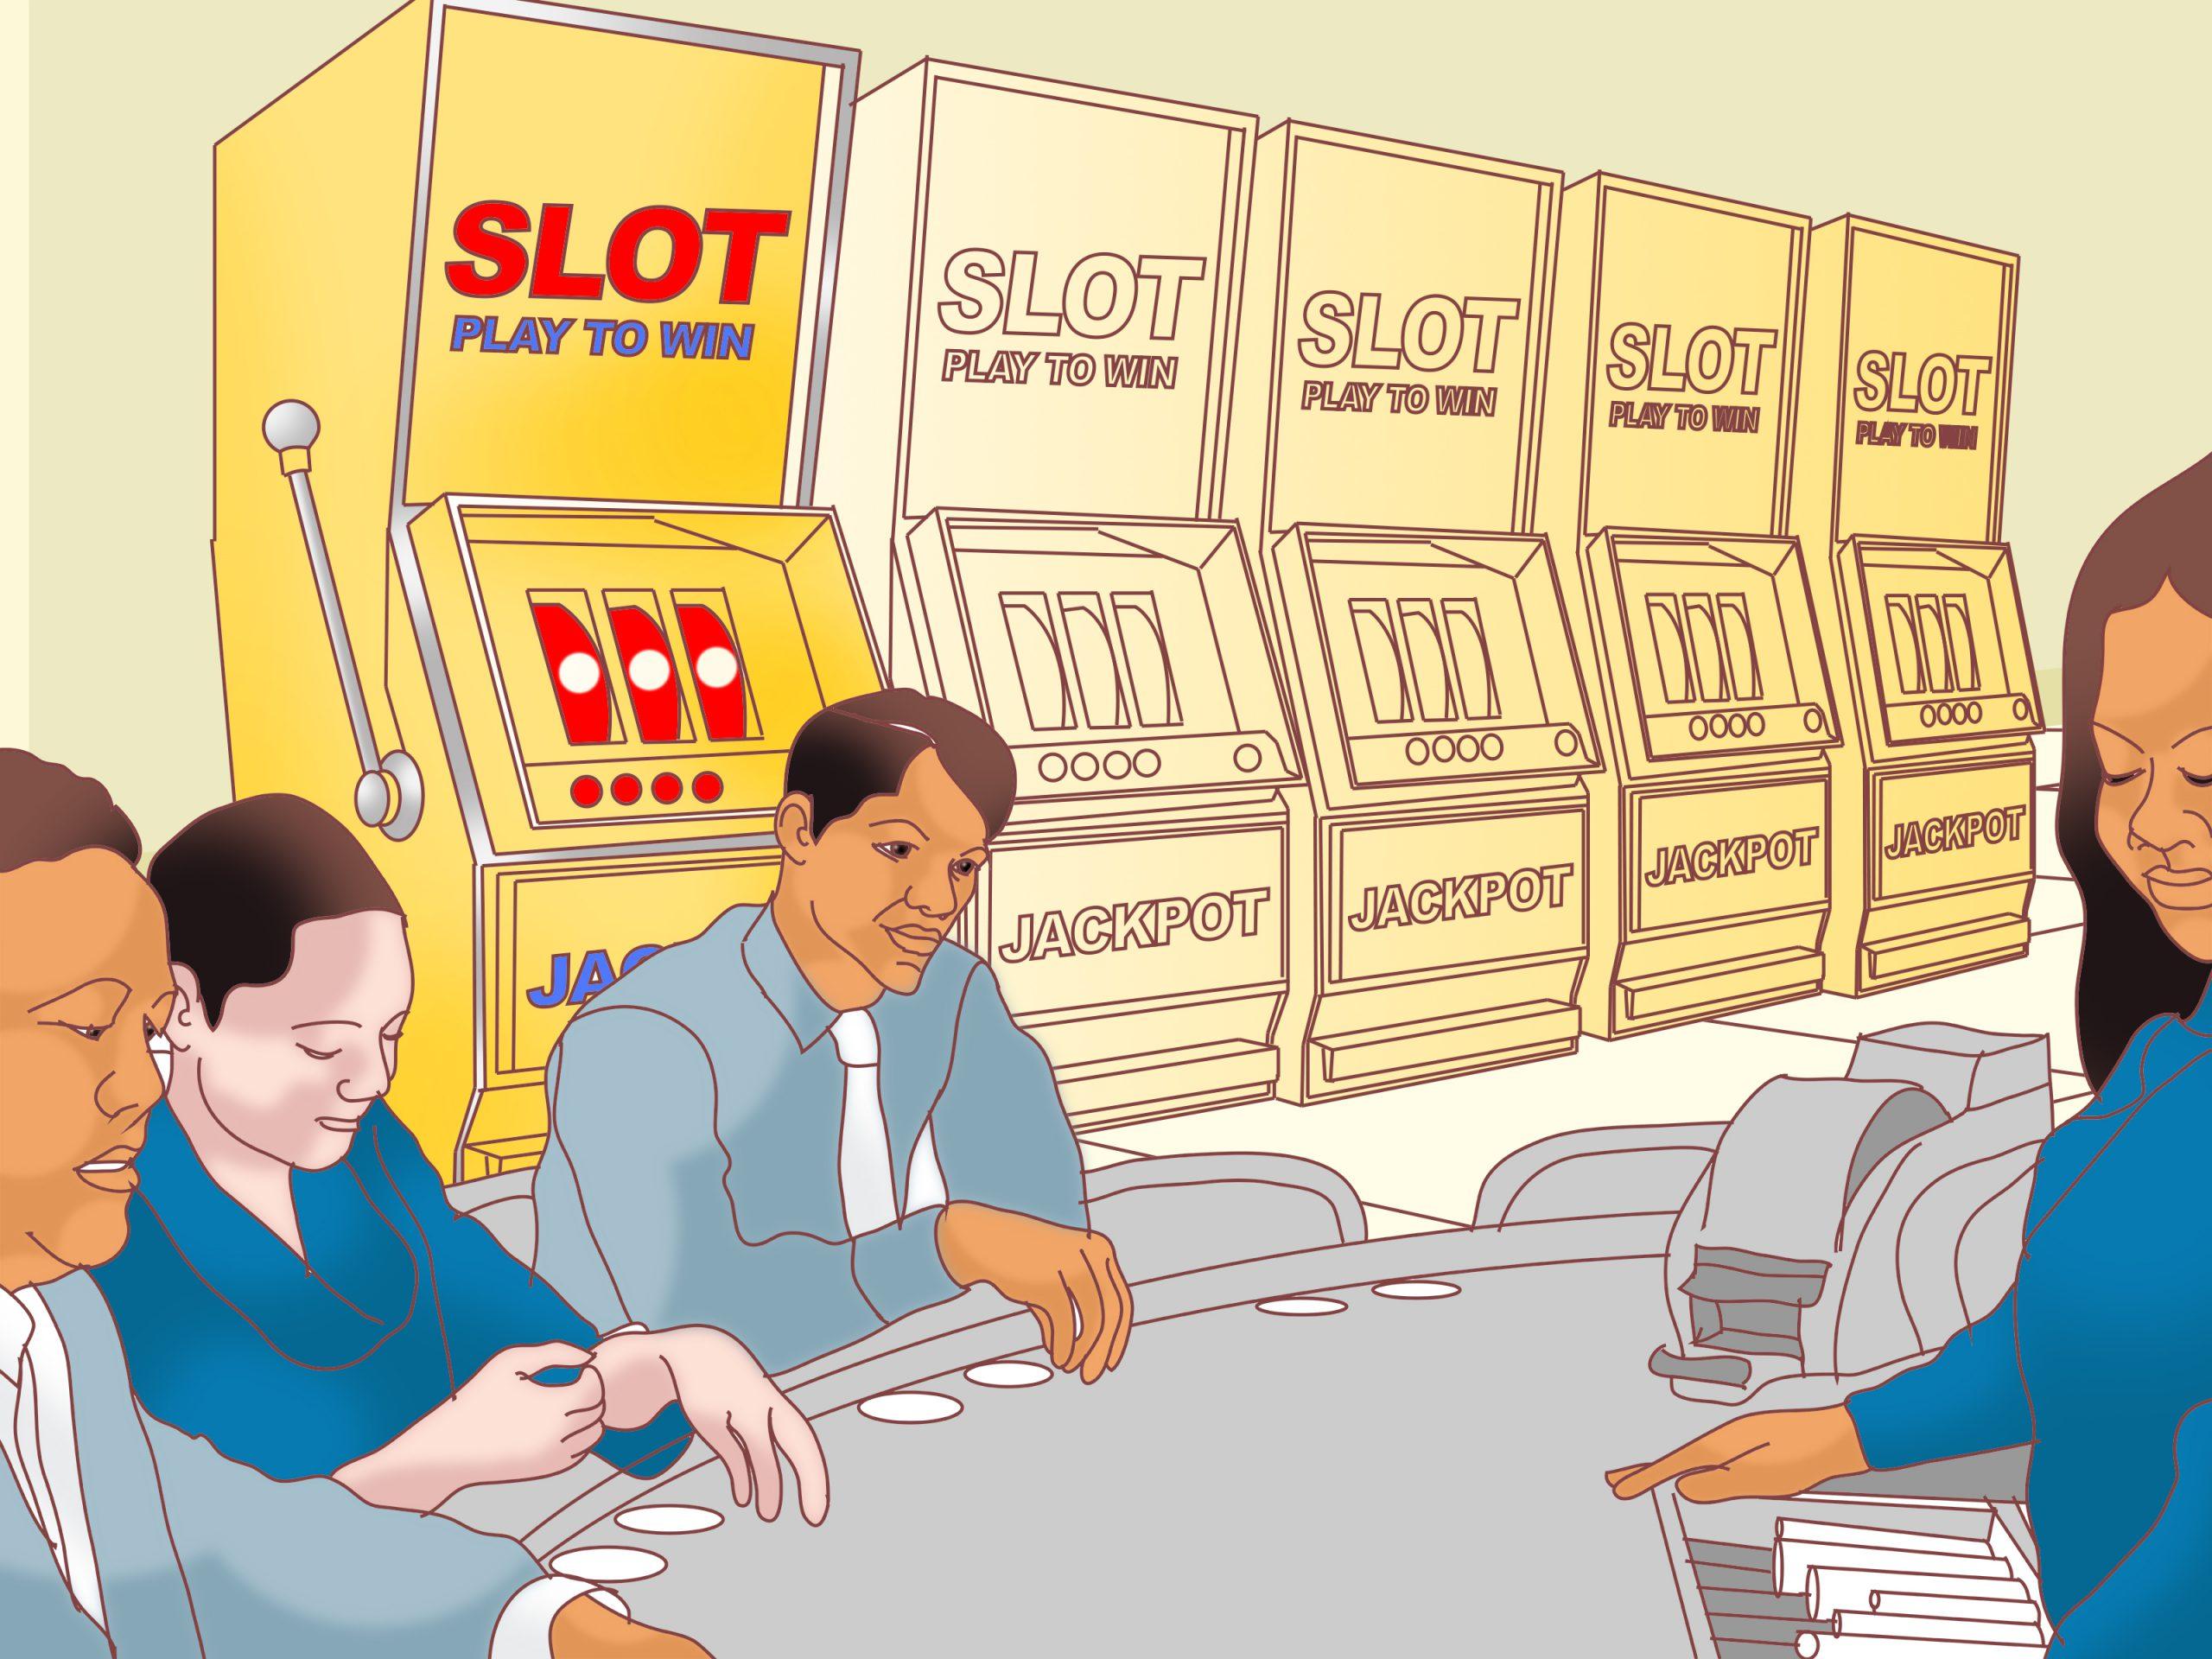 people play slot